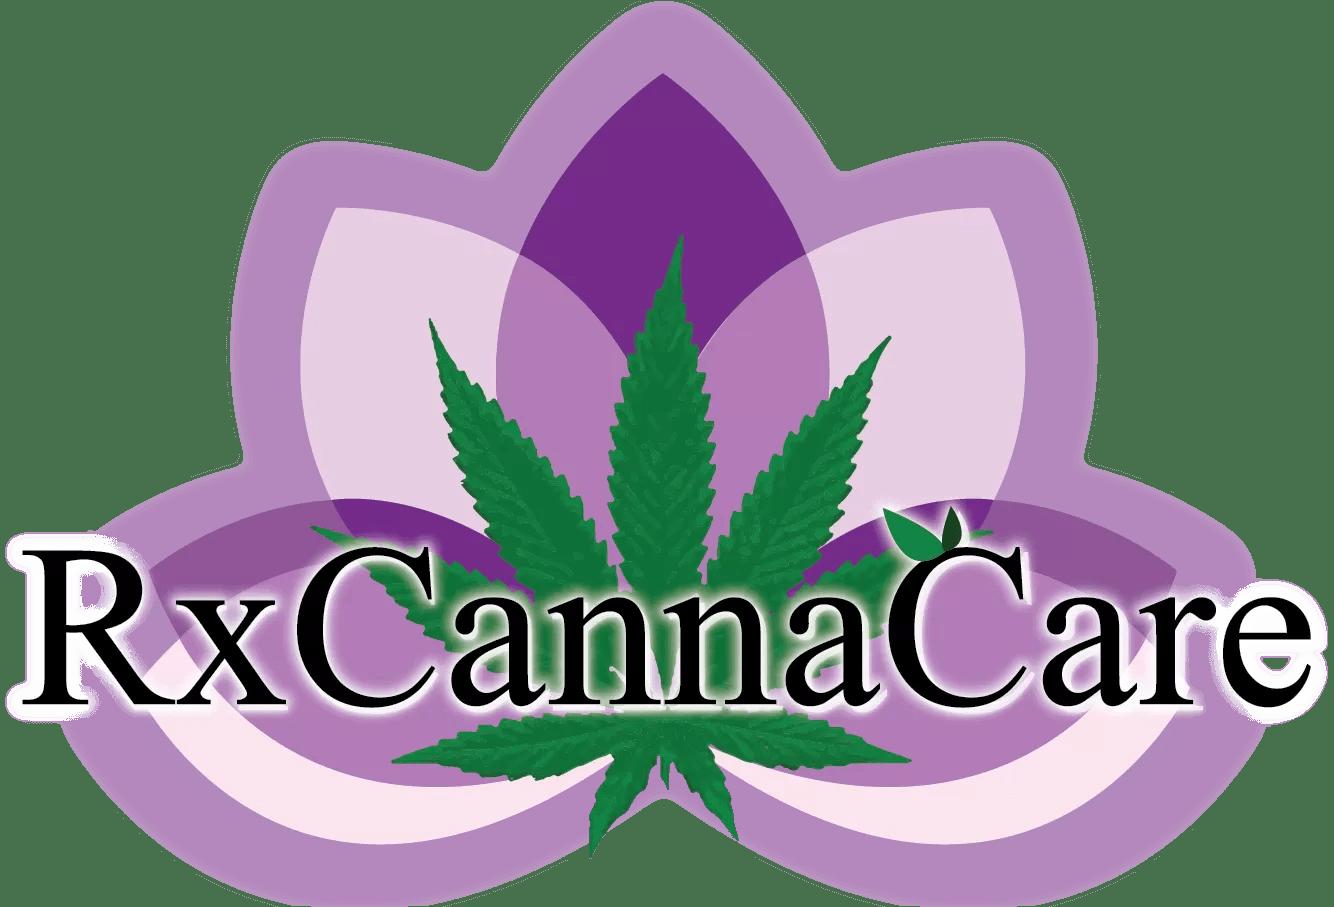 Rx Canna Care LTD